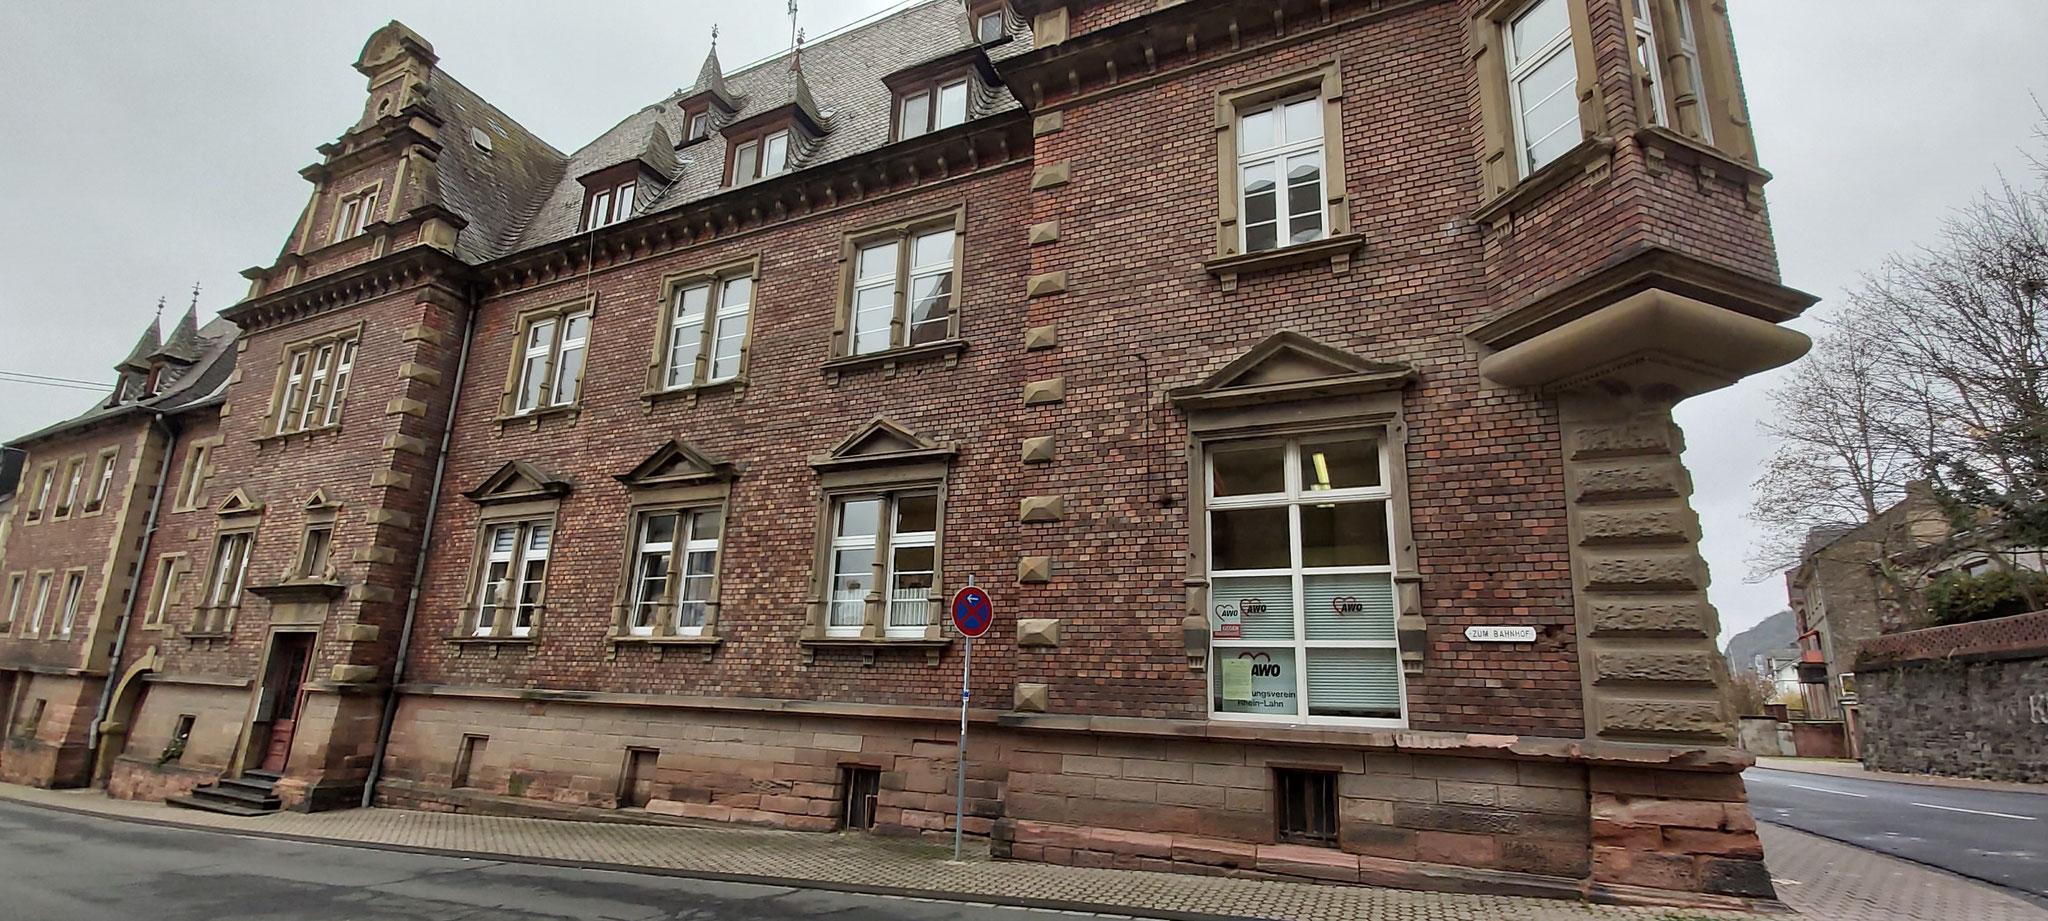 Das Kita-Provisorium - früher war hier das Braubacher Amtsgericht